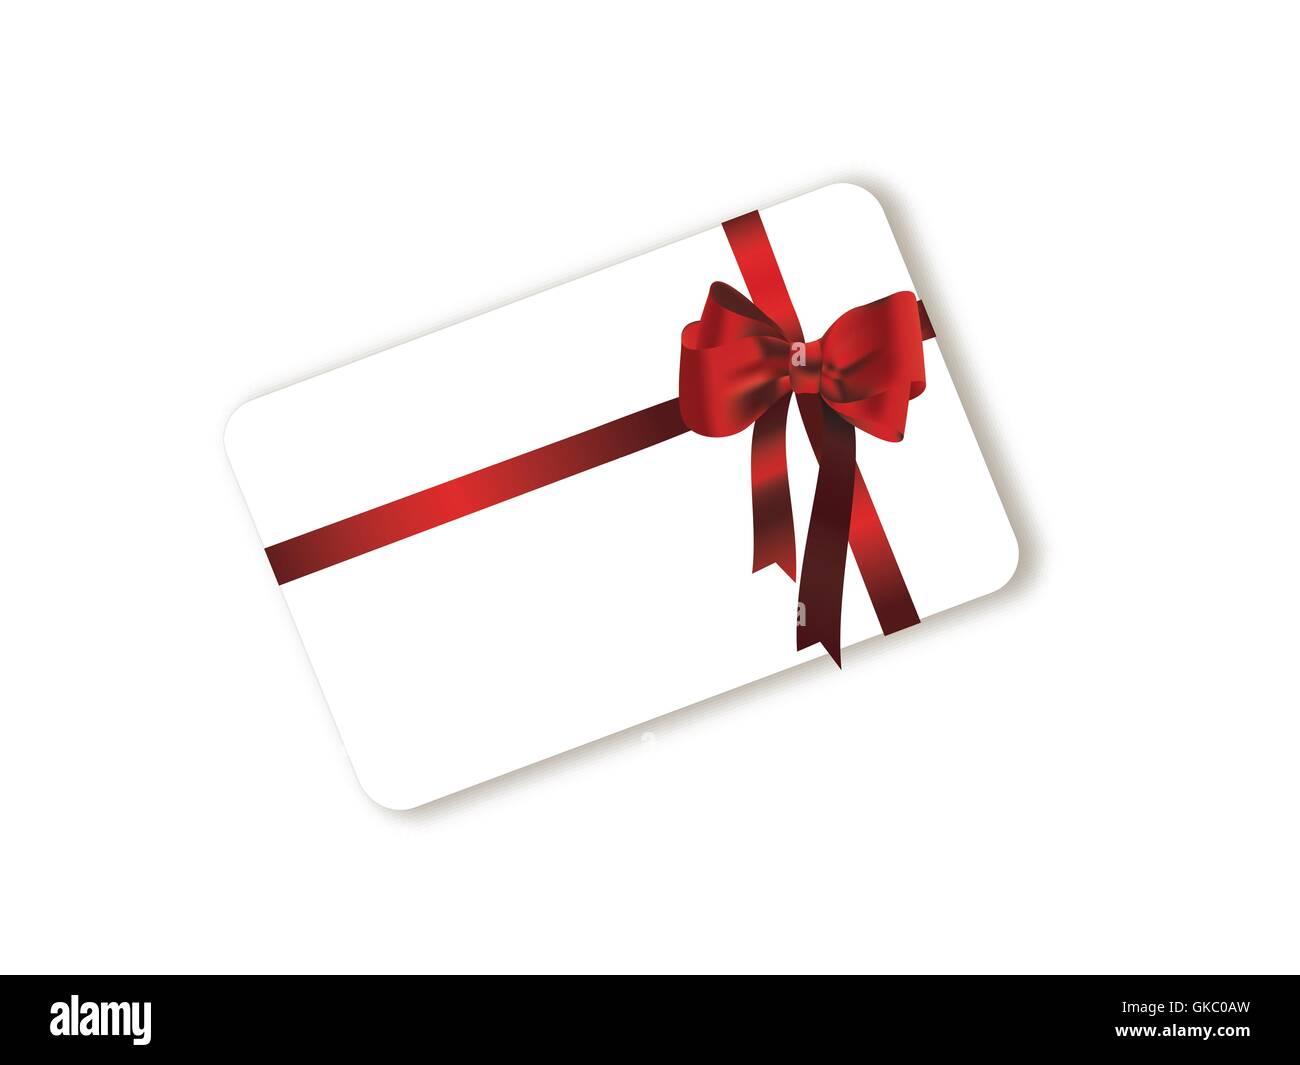 Geschenk-Karte-Schleife Stockfoto, Bild: 115204401 - Alamy